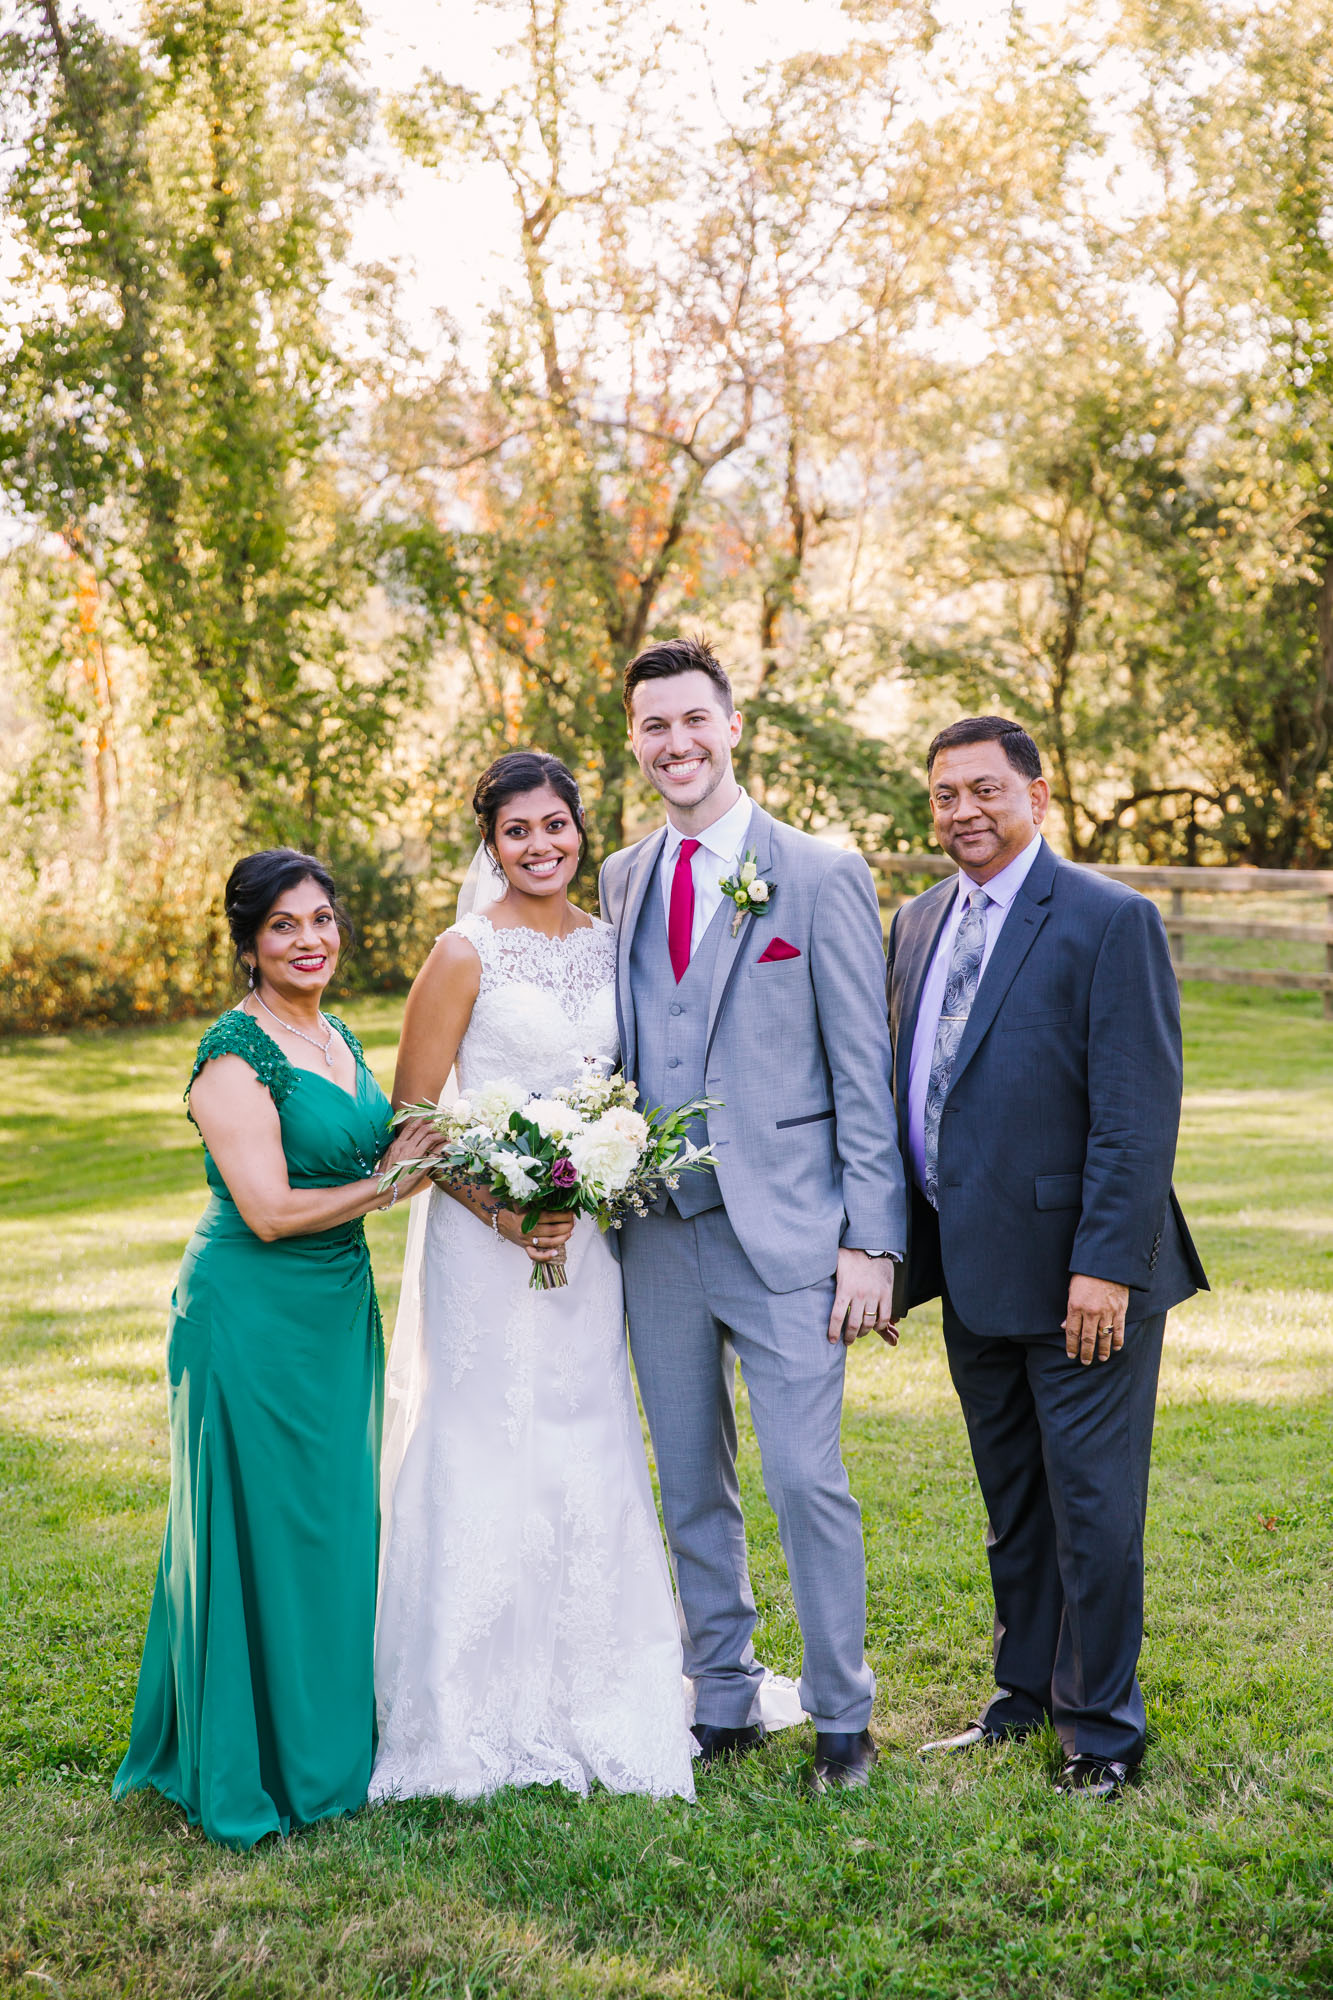 Waynesville NC Wedding Photography | Family Portrait